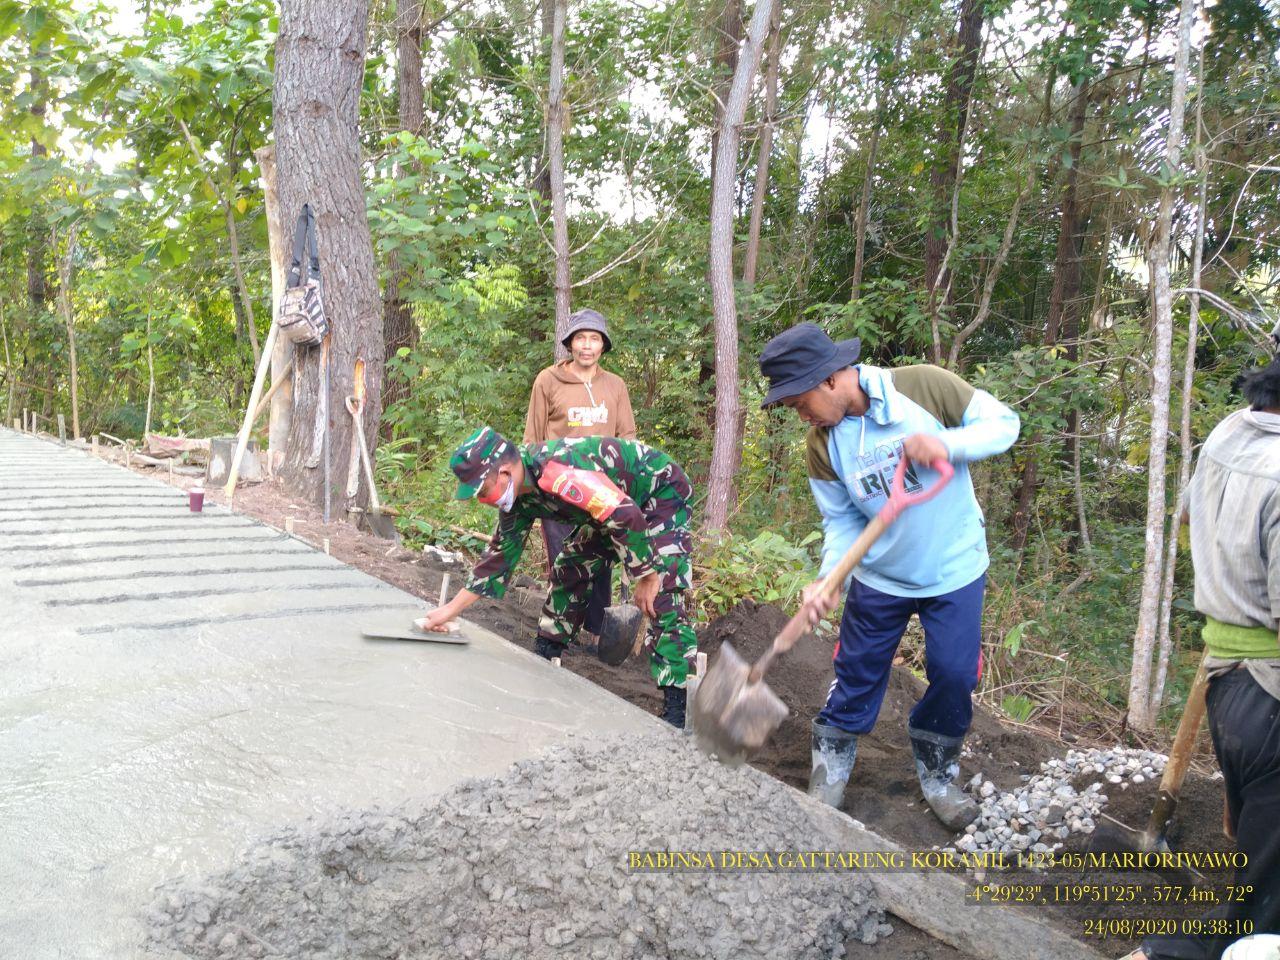 Wujudkan Kemanunggalan TNI dan Rakyat, Koramil 05 Marioriwawo Lakukan Ini